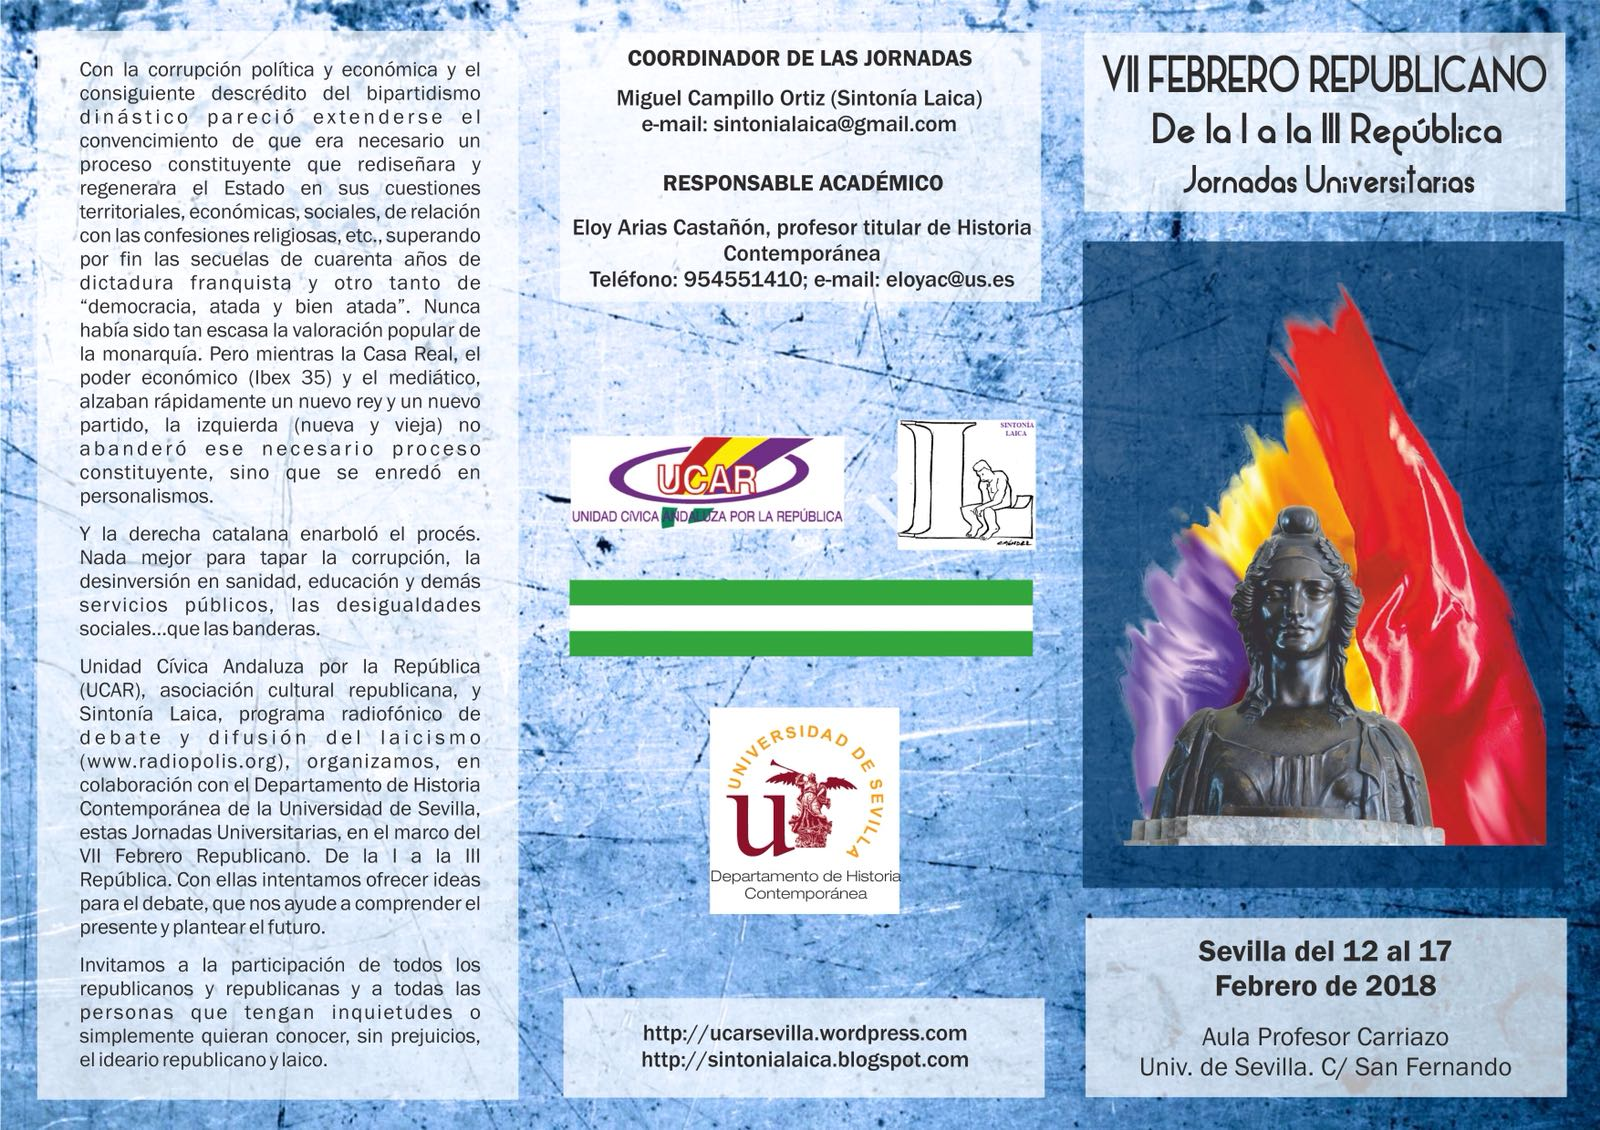 VIII FEBRERO REPUBLICANO: De la I a la III República. Jornadas Universitarias.